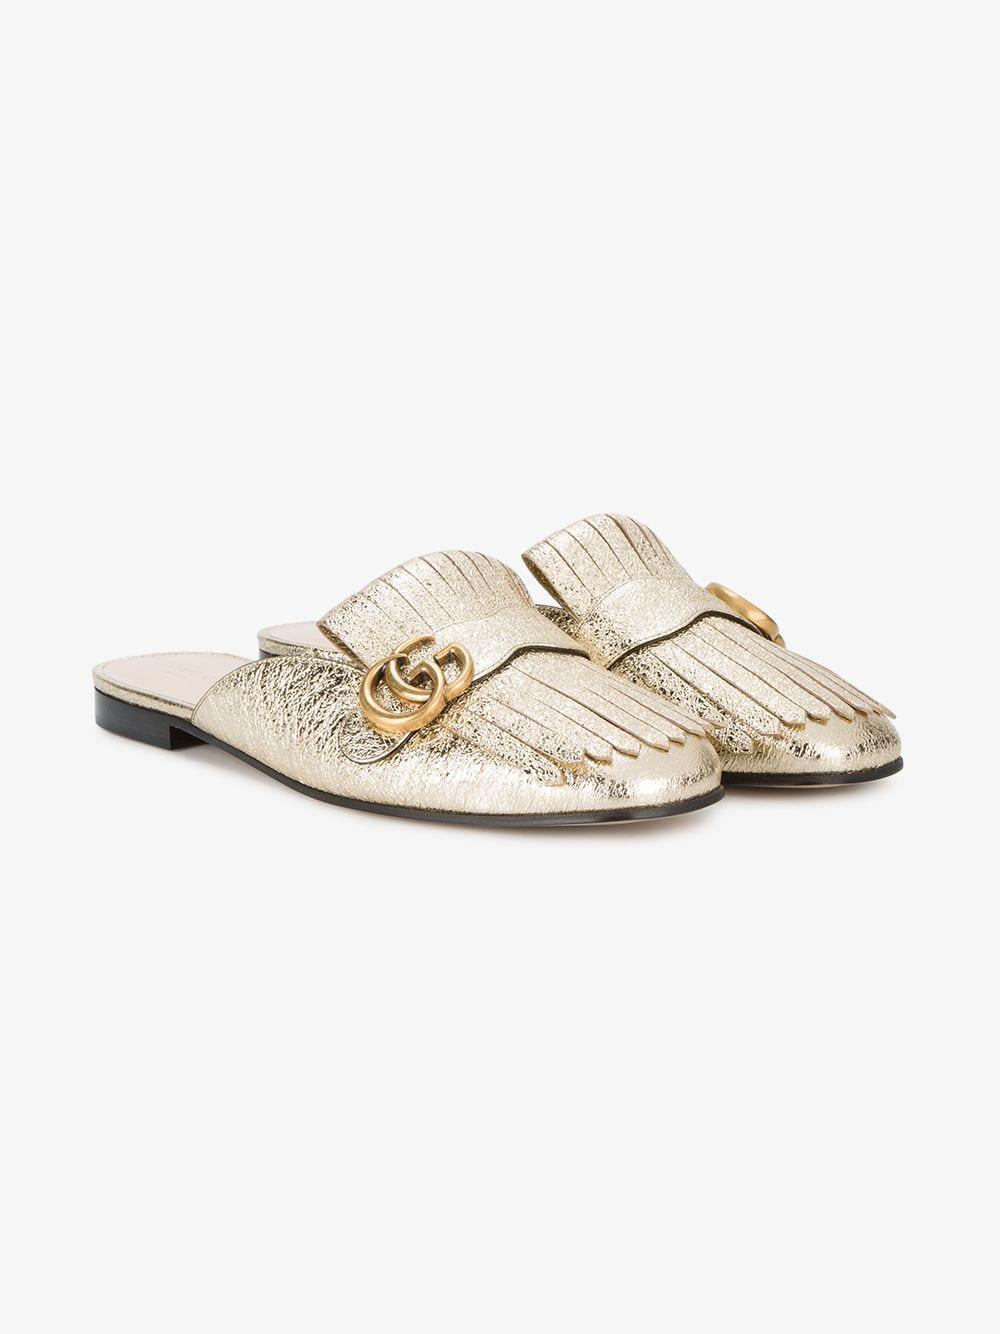 157d88c9a Lyst - Gucci Marmont Metallic Laminate Leather Slipper in Metallic